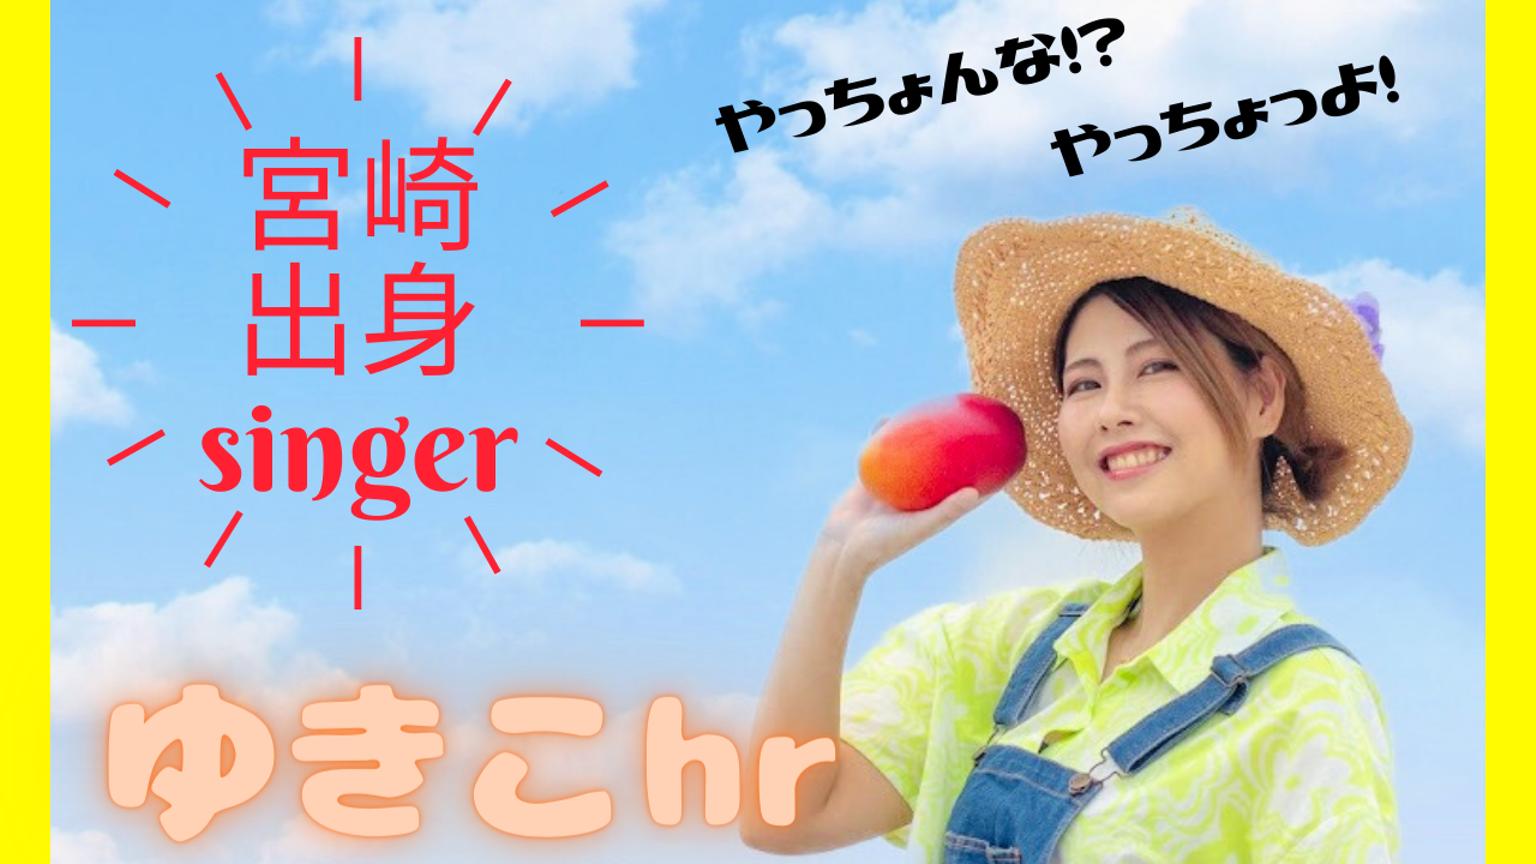 12:00-TVKイベ🎙☀️🗿宮崎出身singerゆきこhr